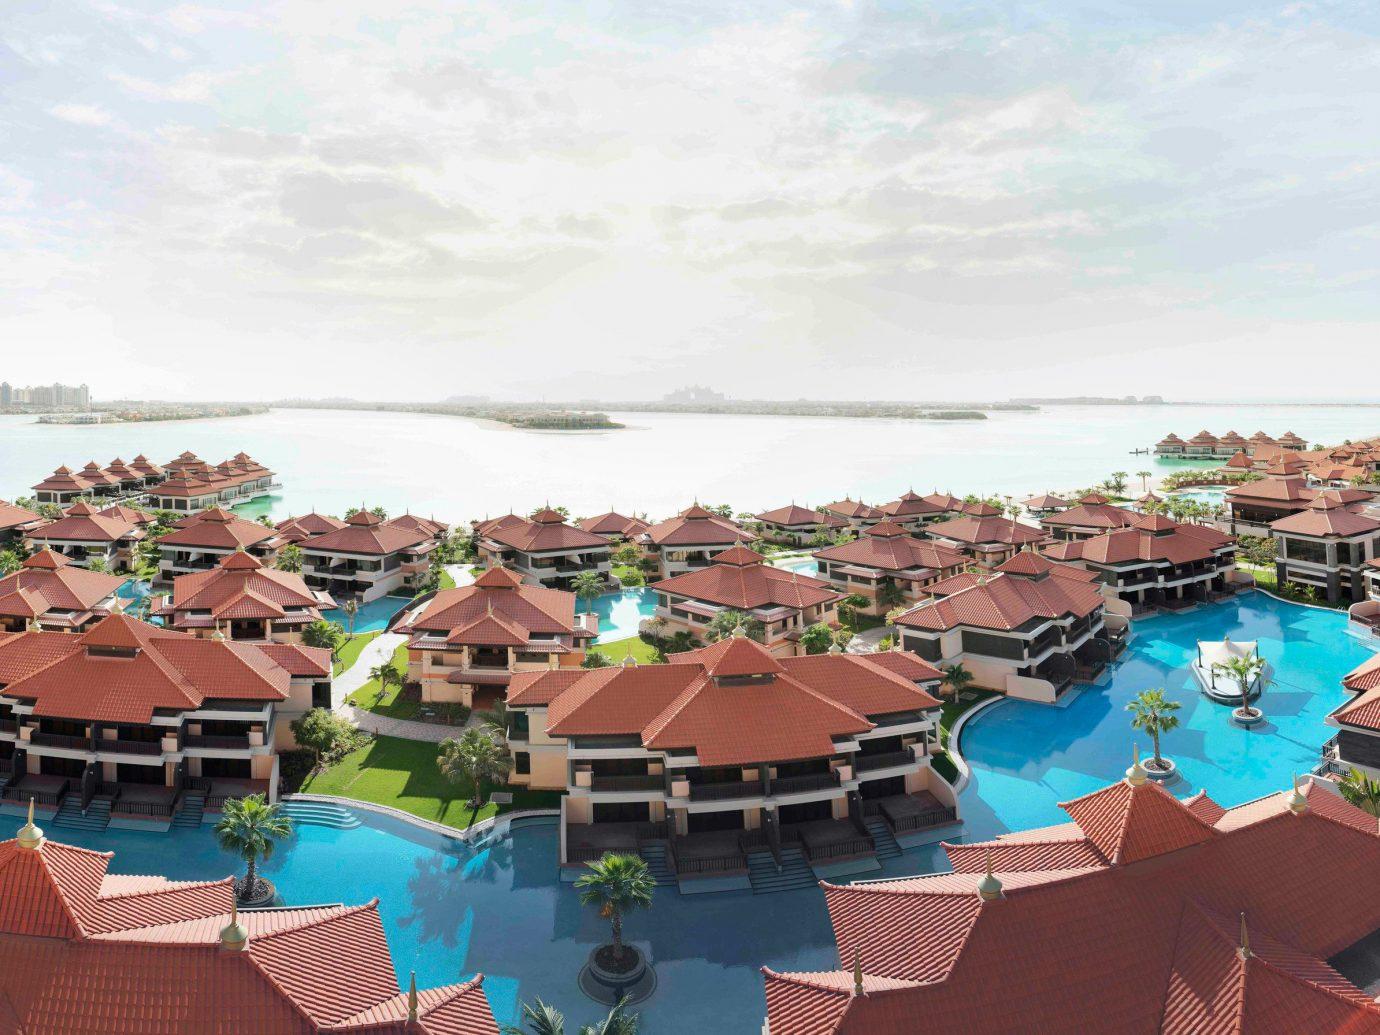 Dubai Hotels Luxury Travel Middle East chair leisure Resort vacation Beach Water park amusement park bay Village marina